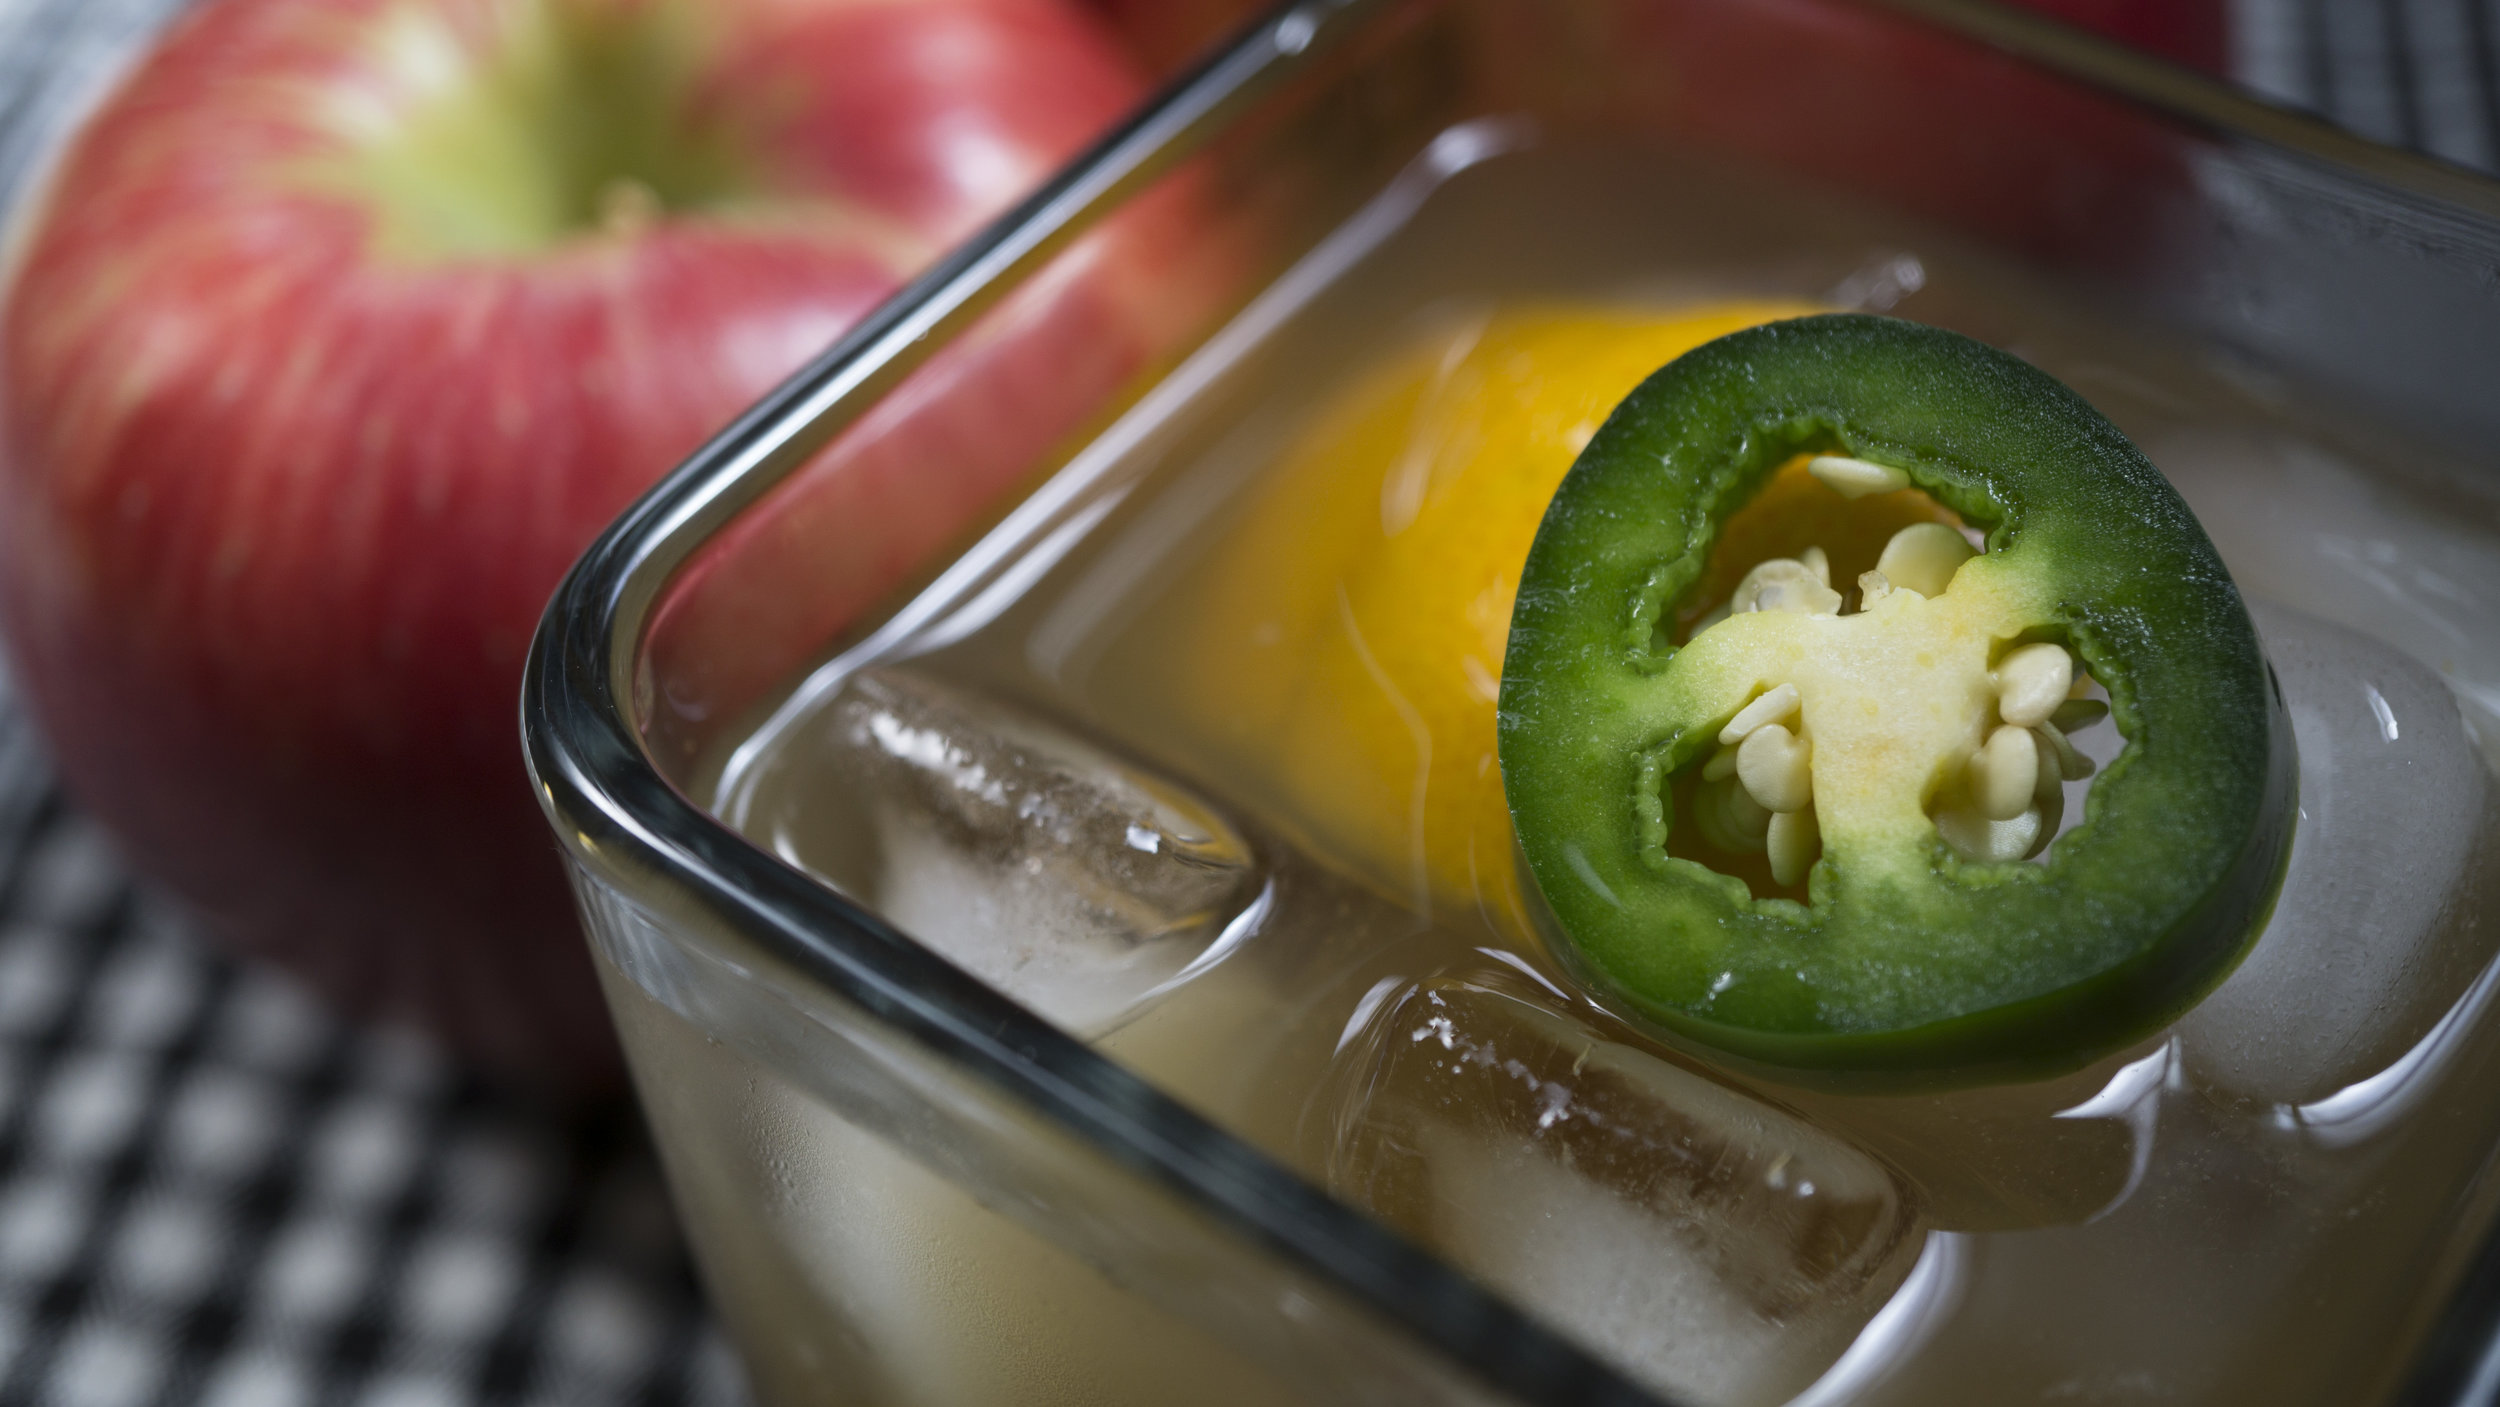 bourbon-and-cider-close-up.jpg